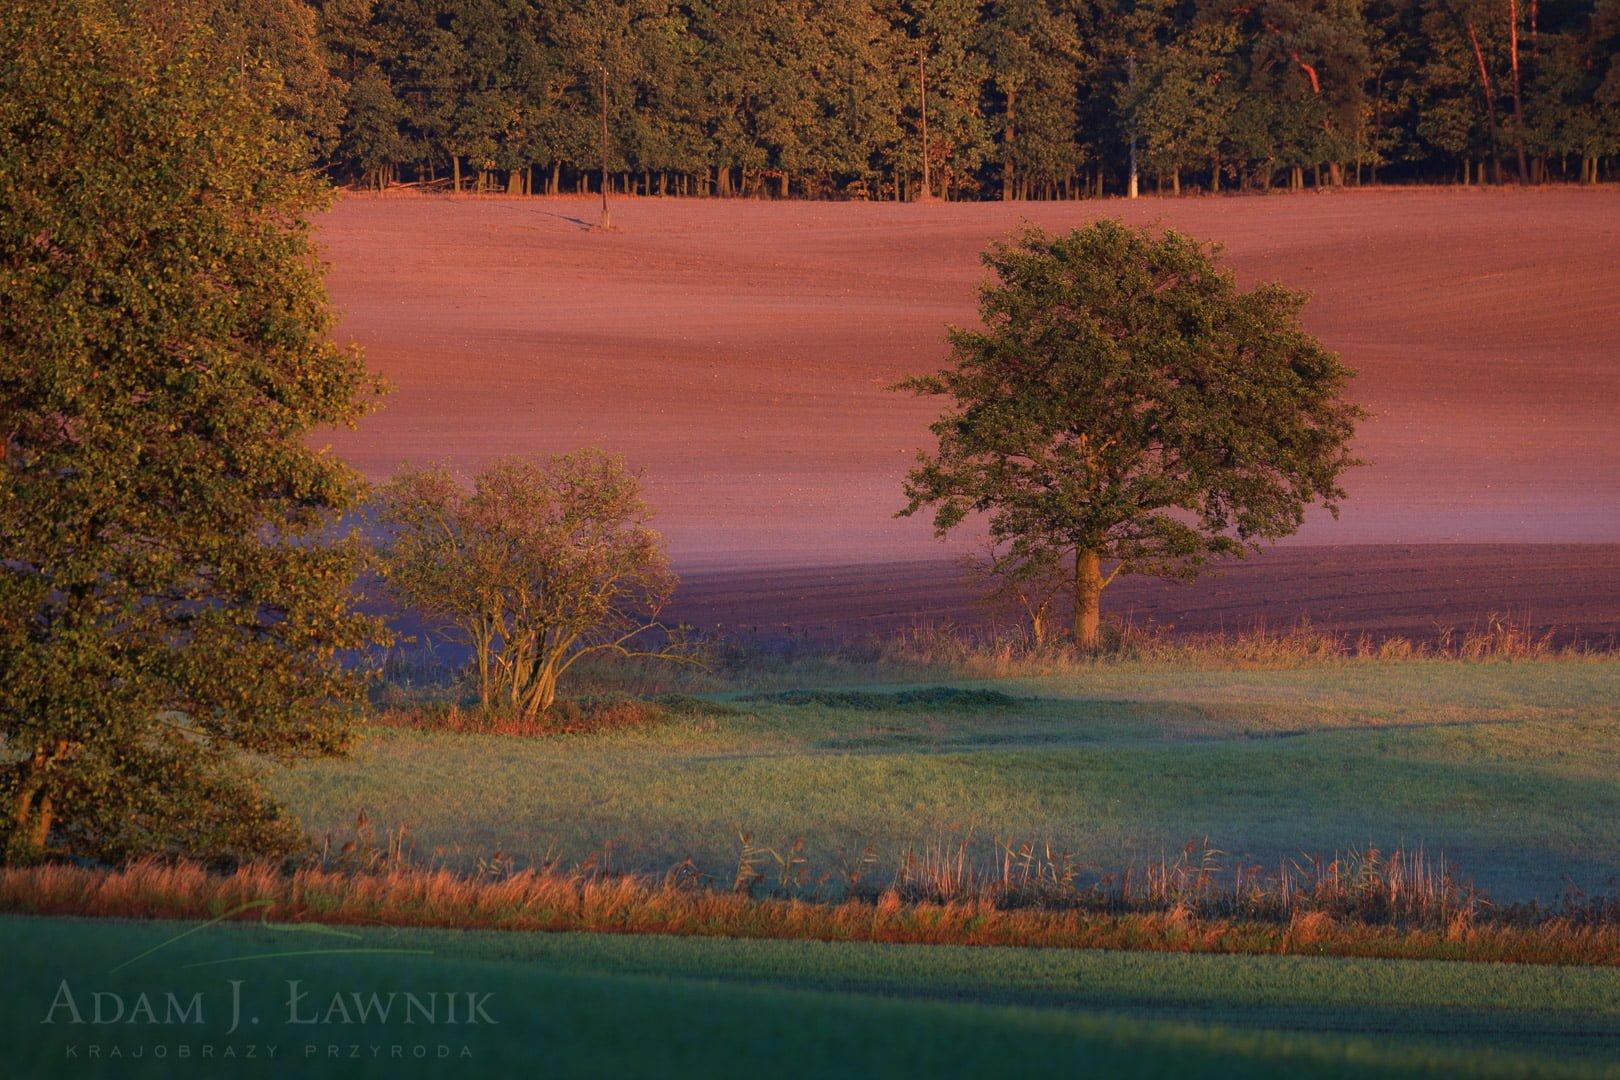 Wielkopolska National Park, Poland 1110-02094C